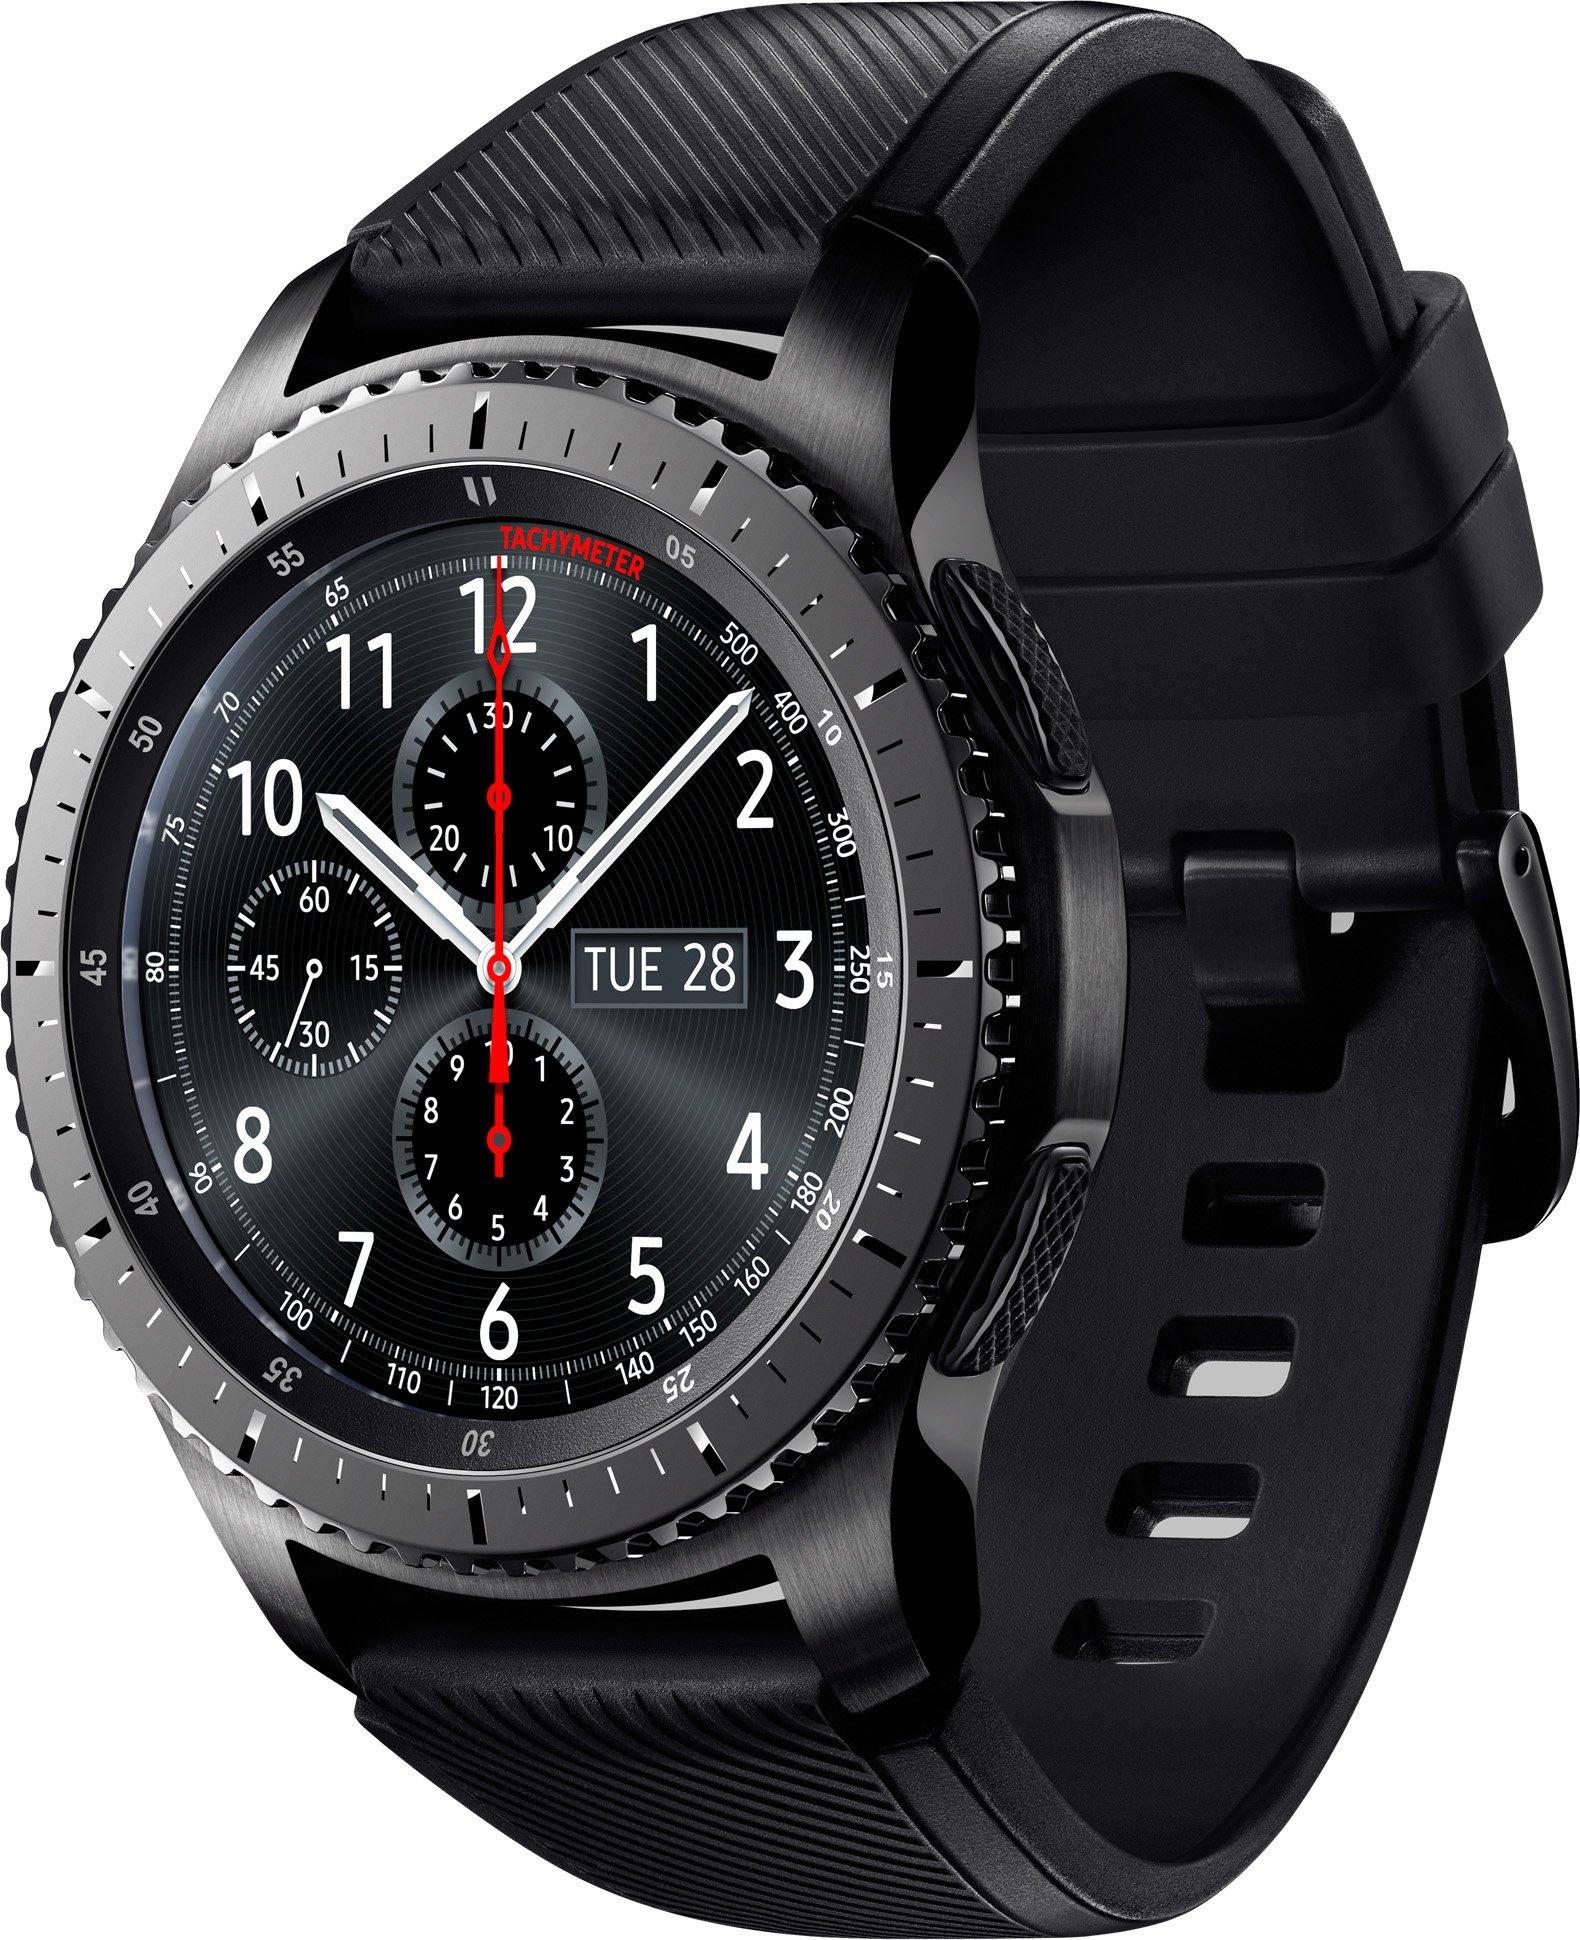 ef79e904 Смарт-часы Samsung Gear S3 Frontier Black - купить, цены, отзывы